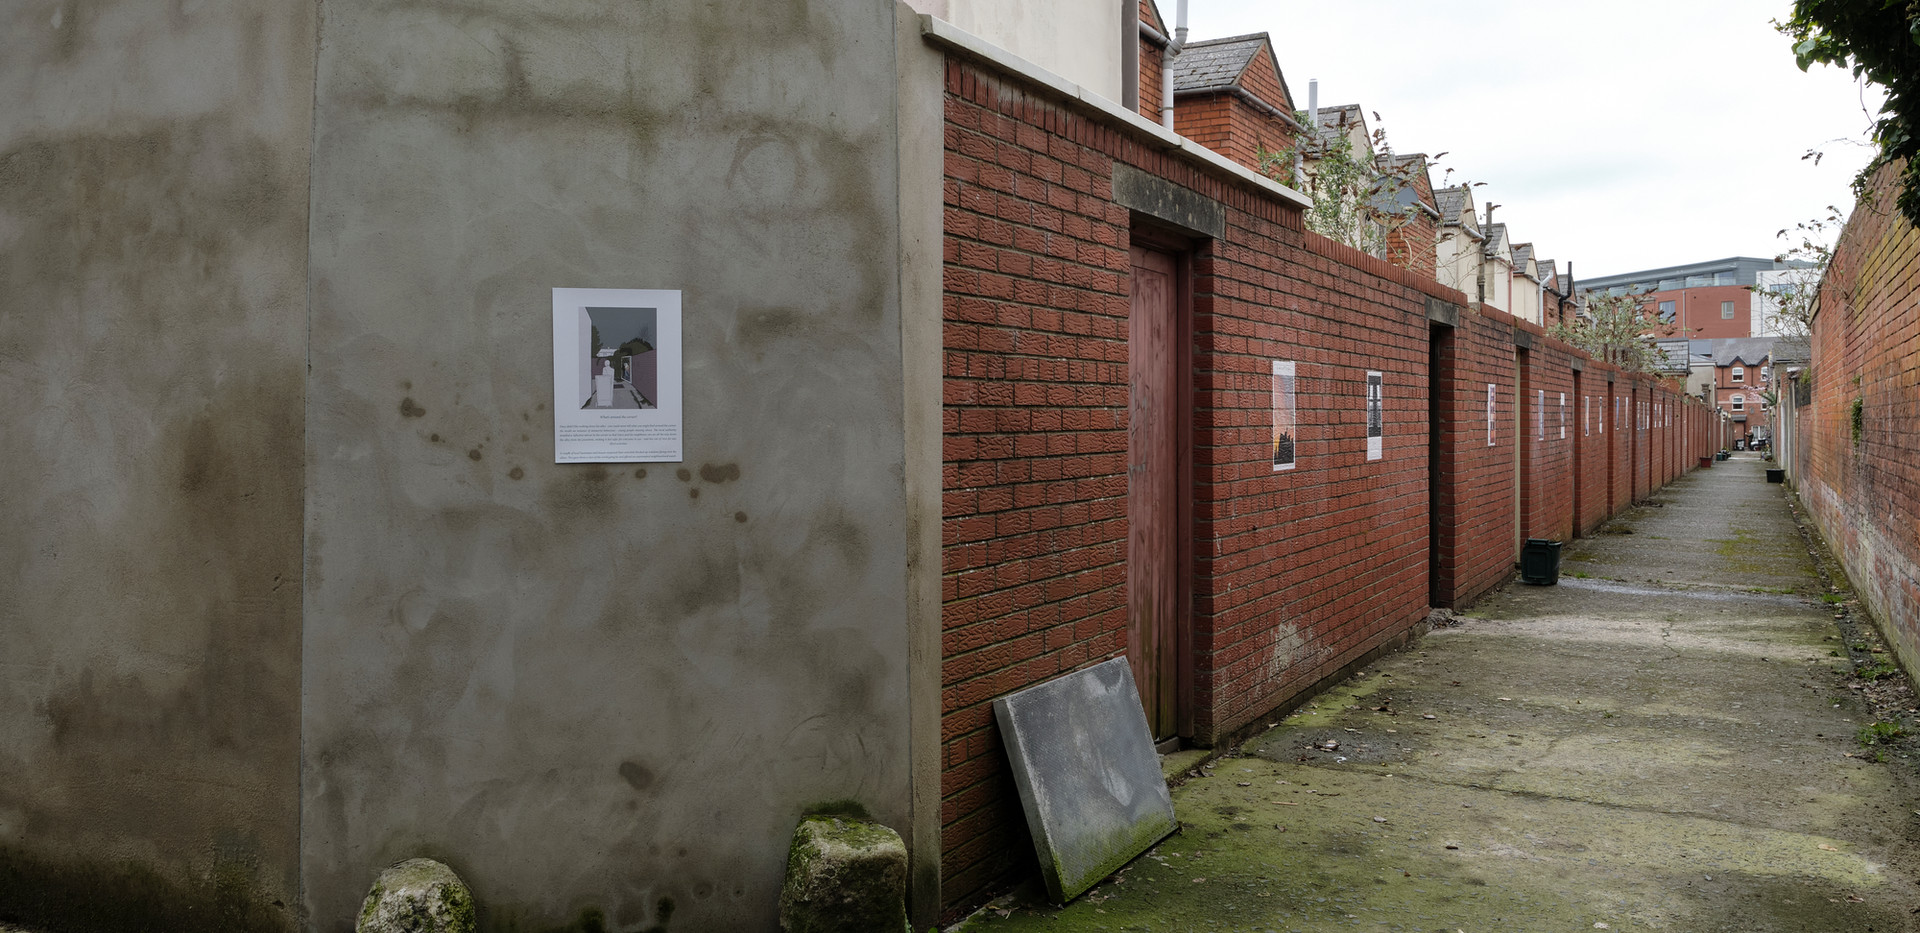 20210325 Limin Alley 150.jpg